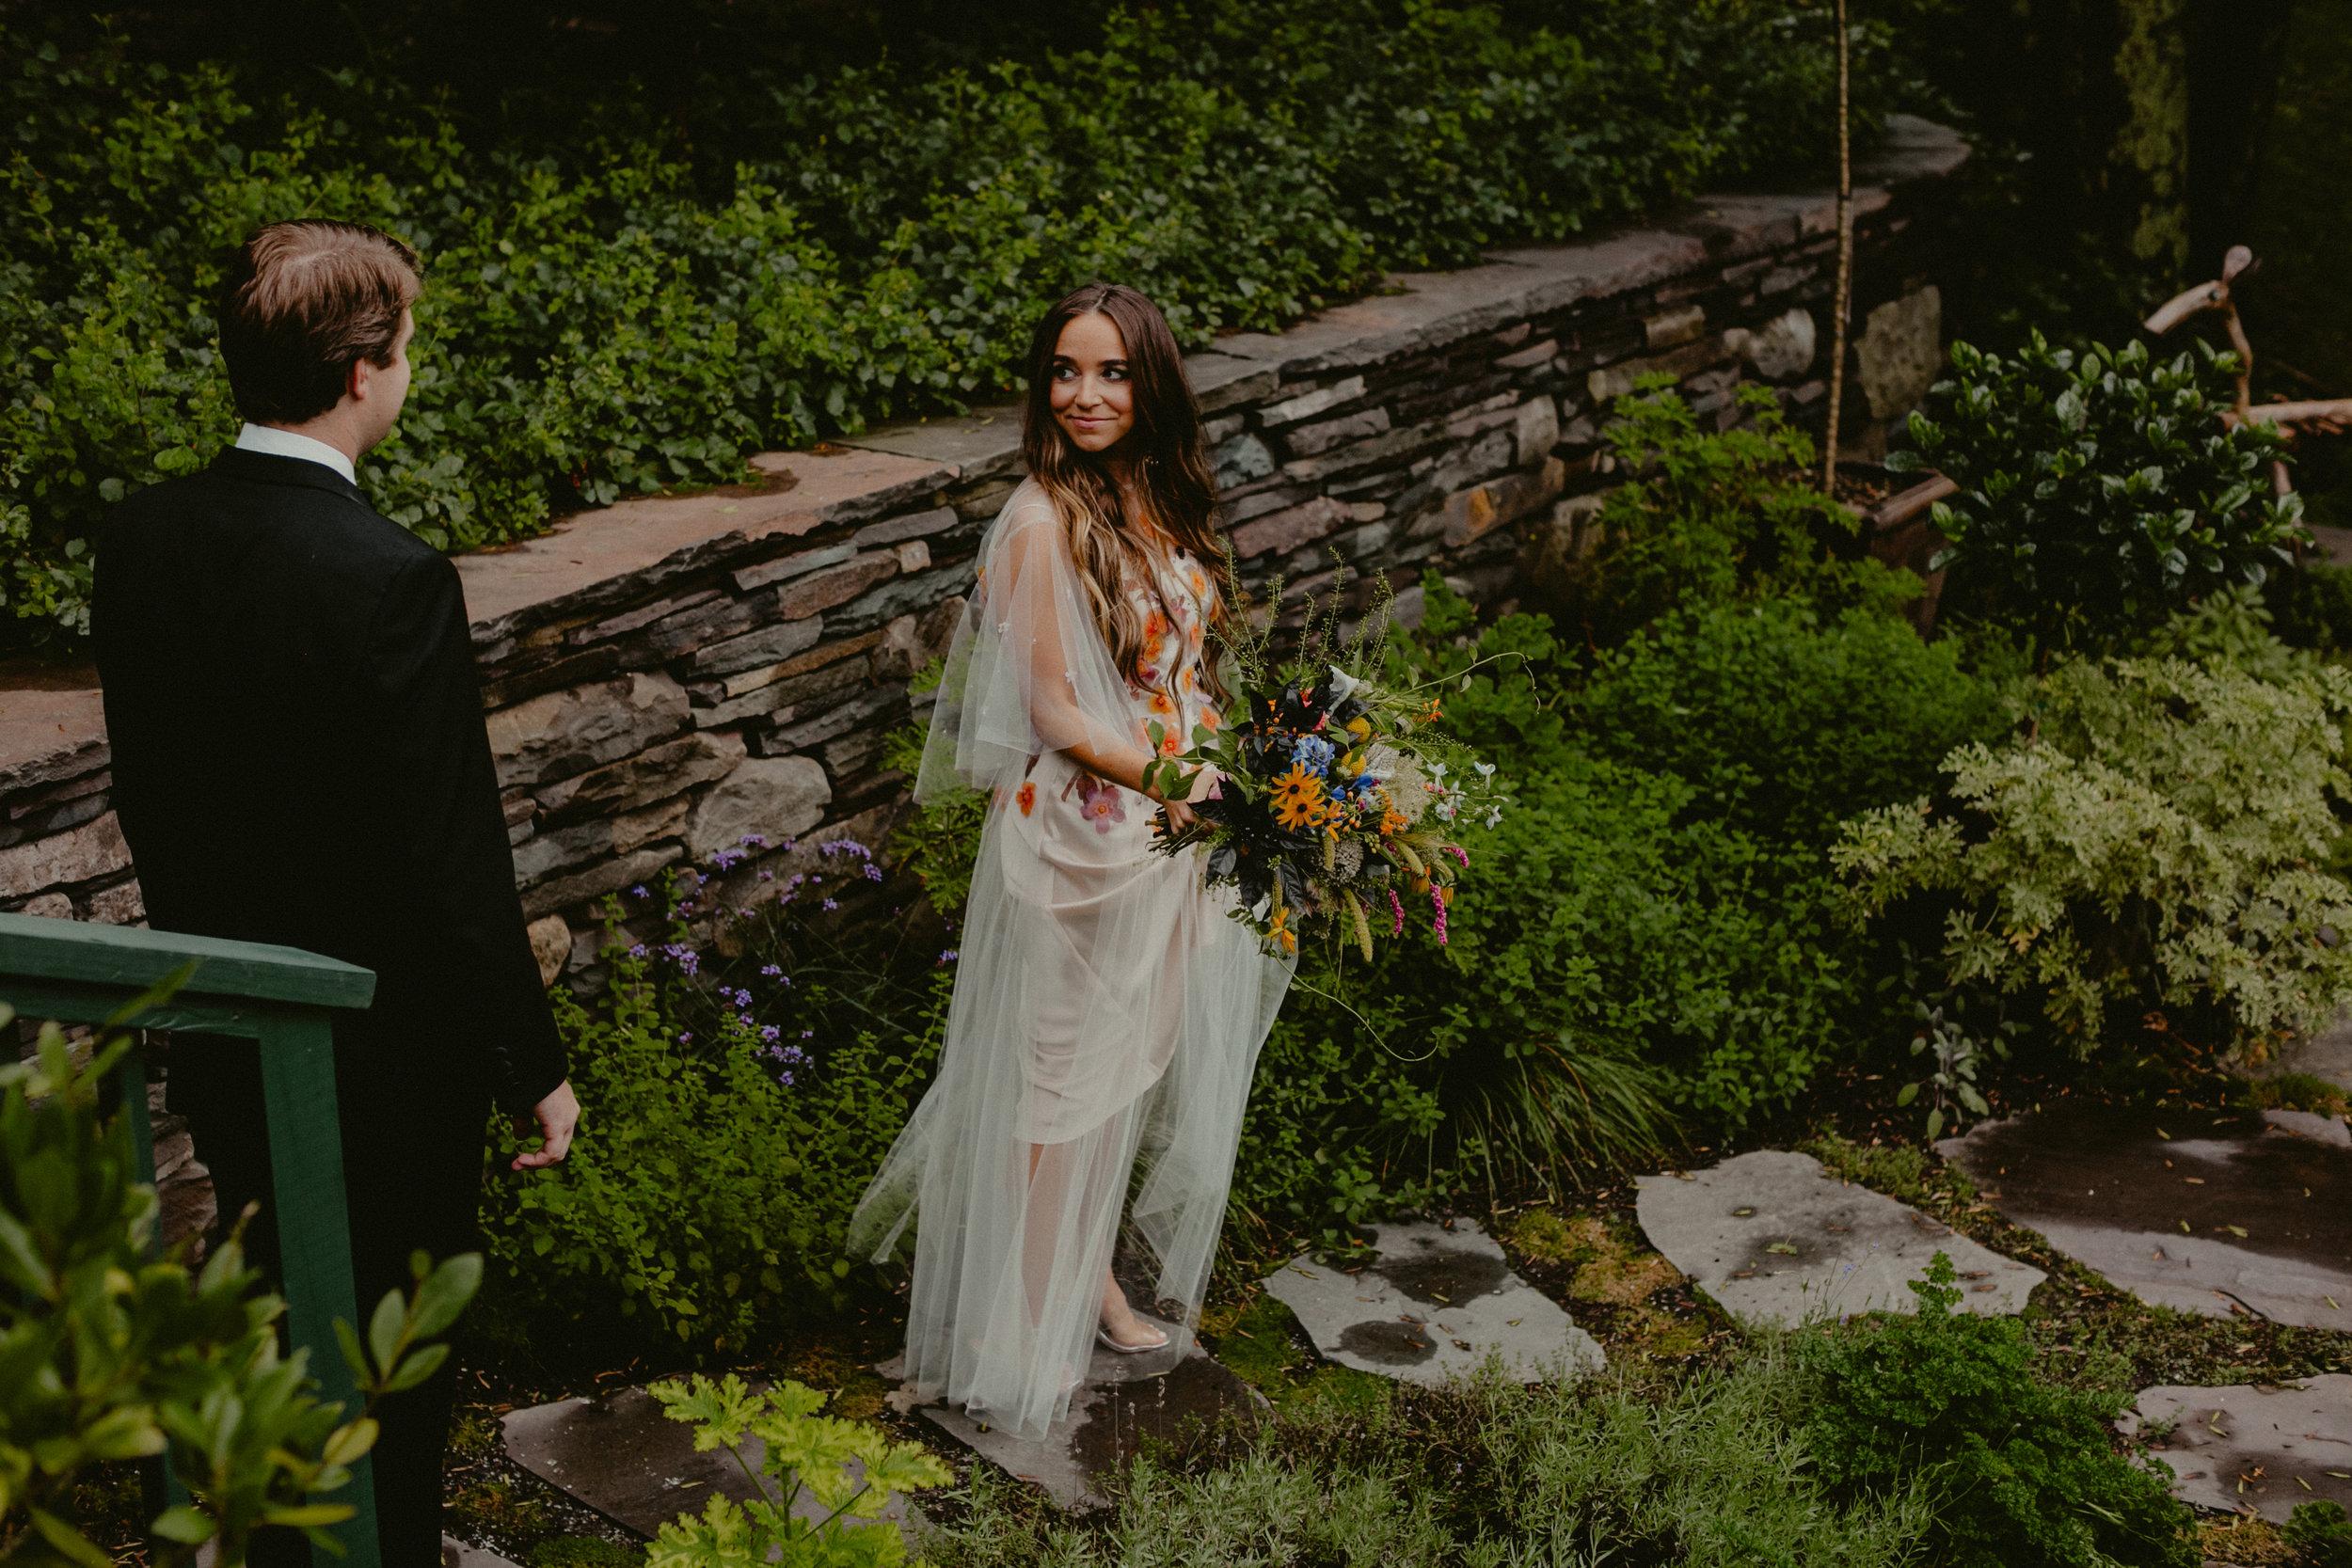 DEER_MOUNTAIN_INN_WEDDING_CHELLISE_MICHAEL_PHOTOGRAPHY-1193.jpg